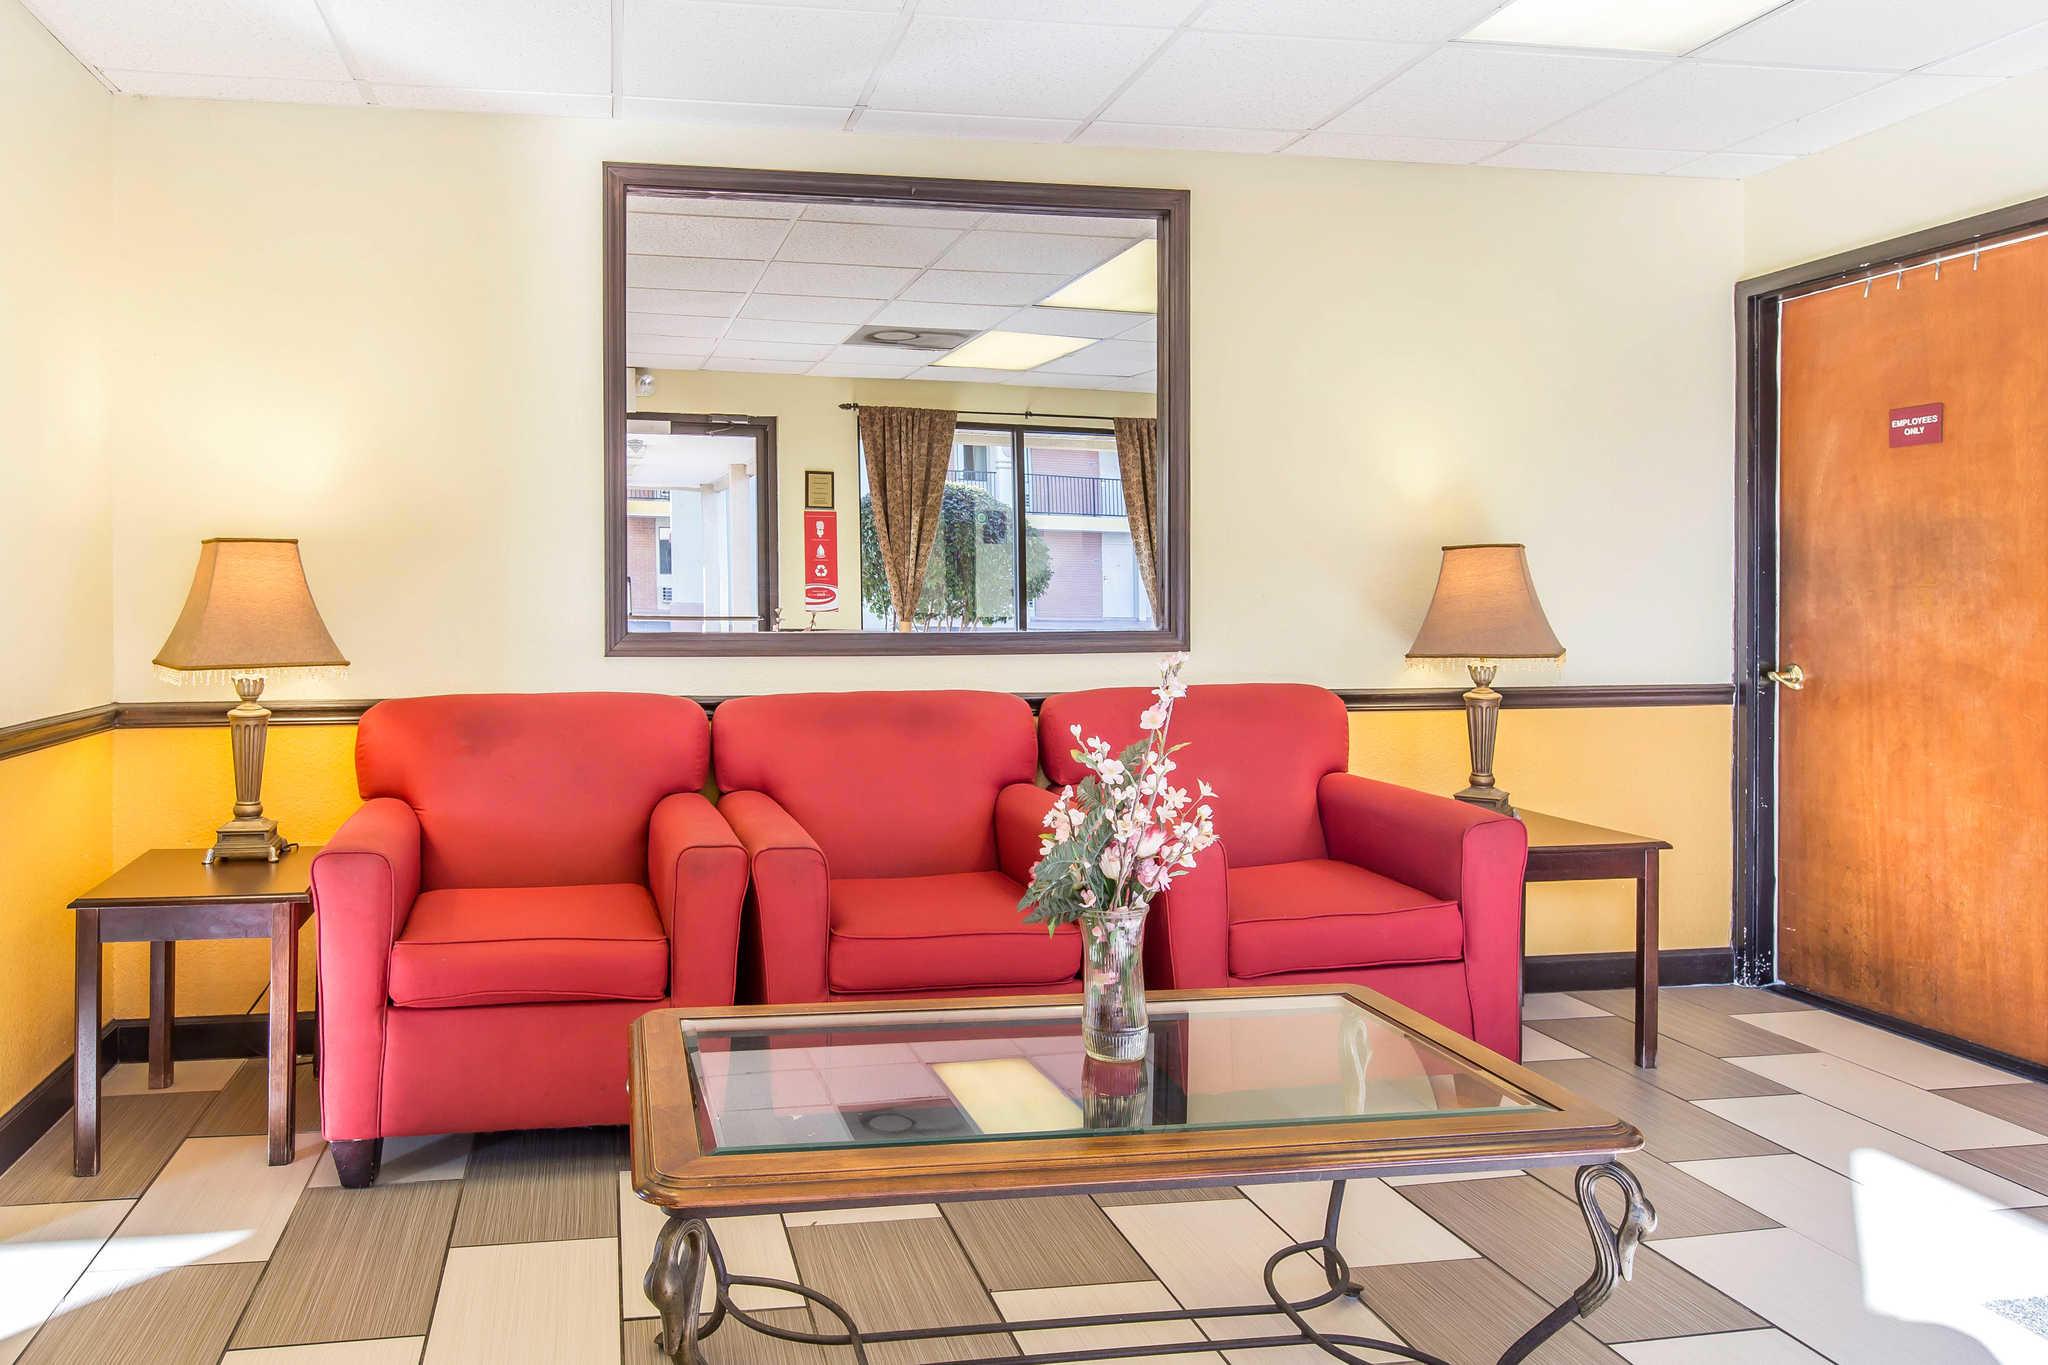 Econo Lodge Inn & Suites image 4